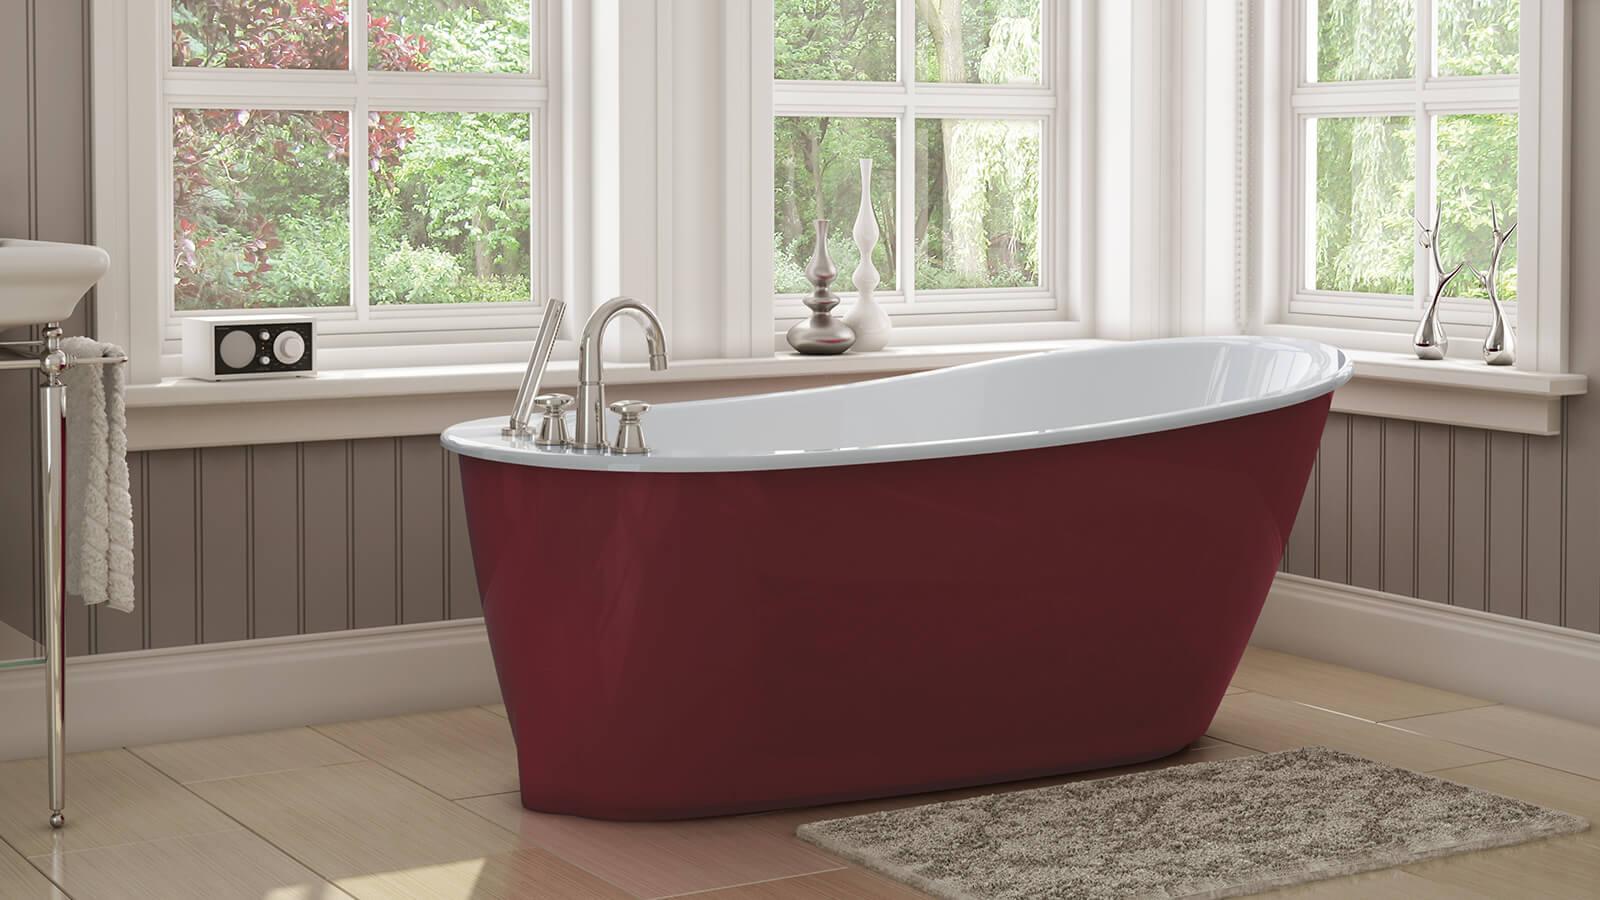 Sax - Freestanding bathtub